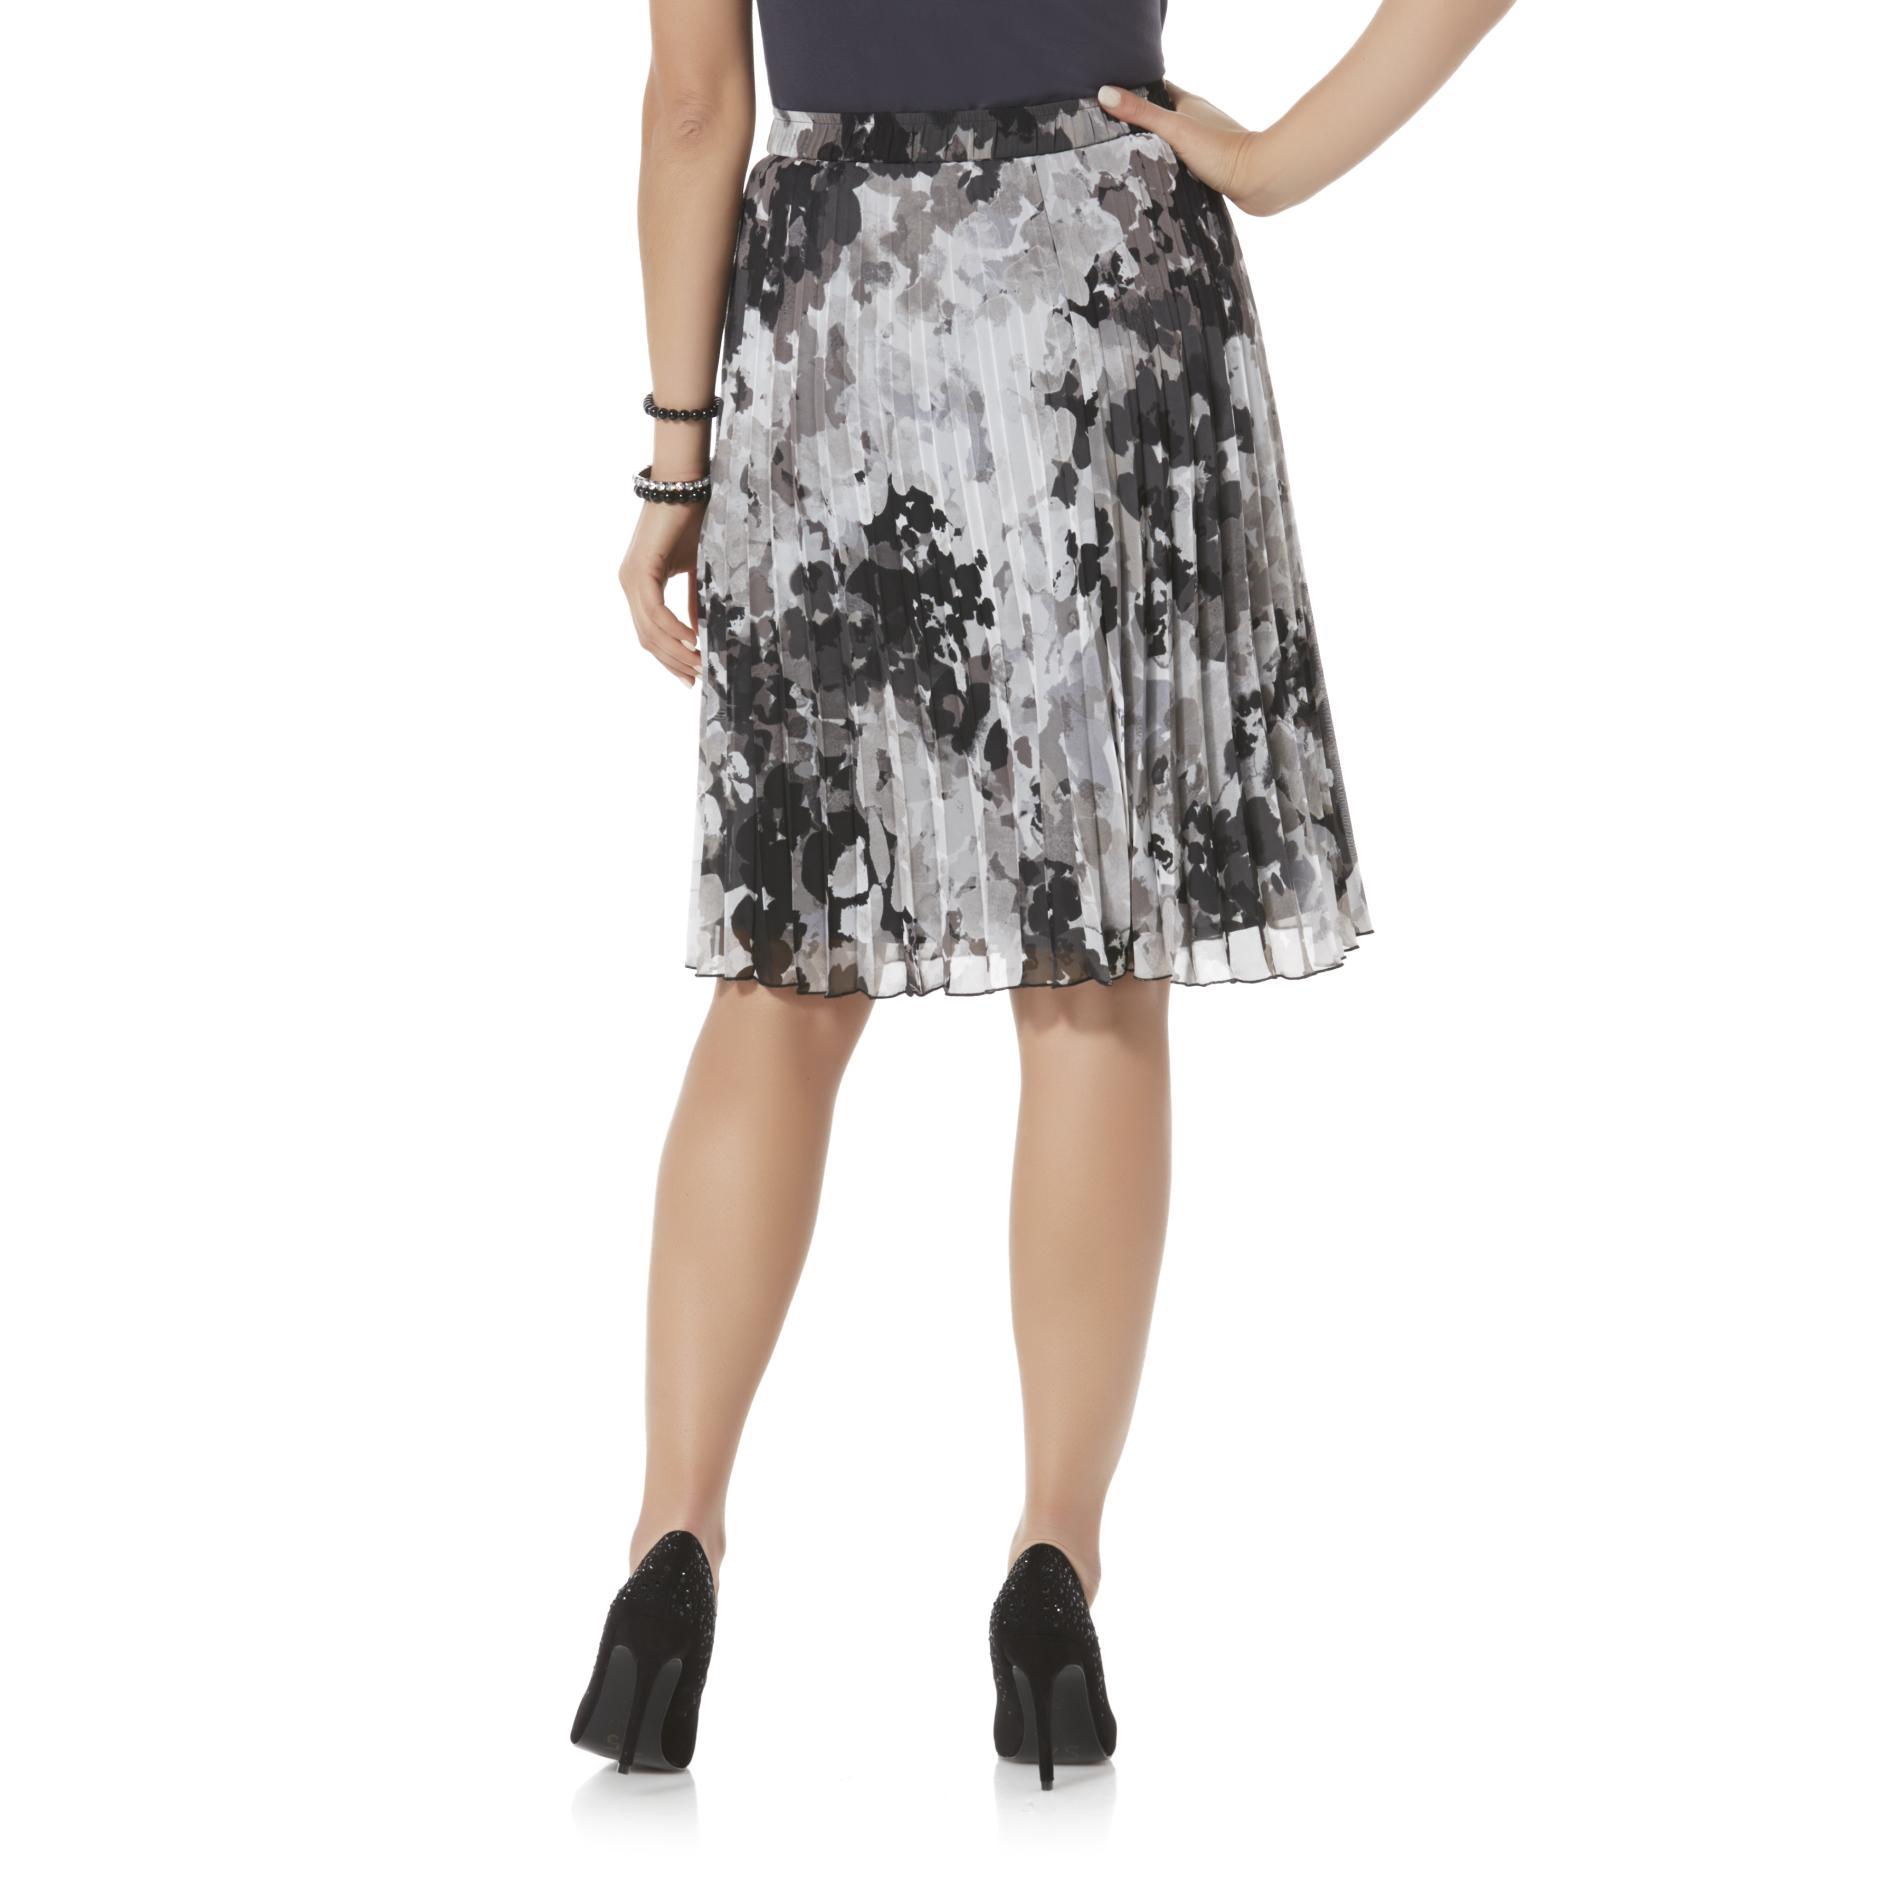 Covington Petite's Pleated Skirt - Floral